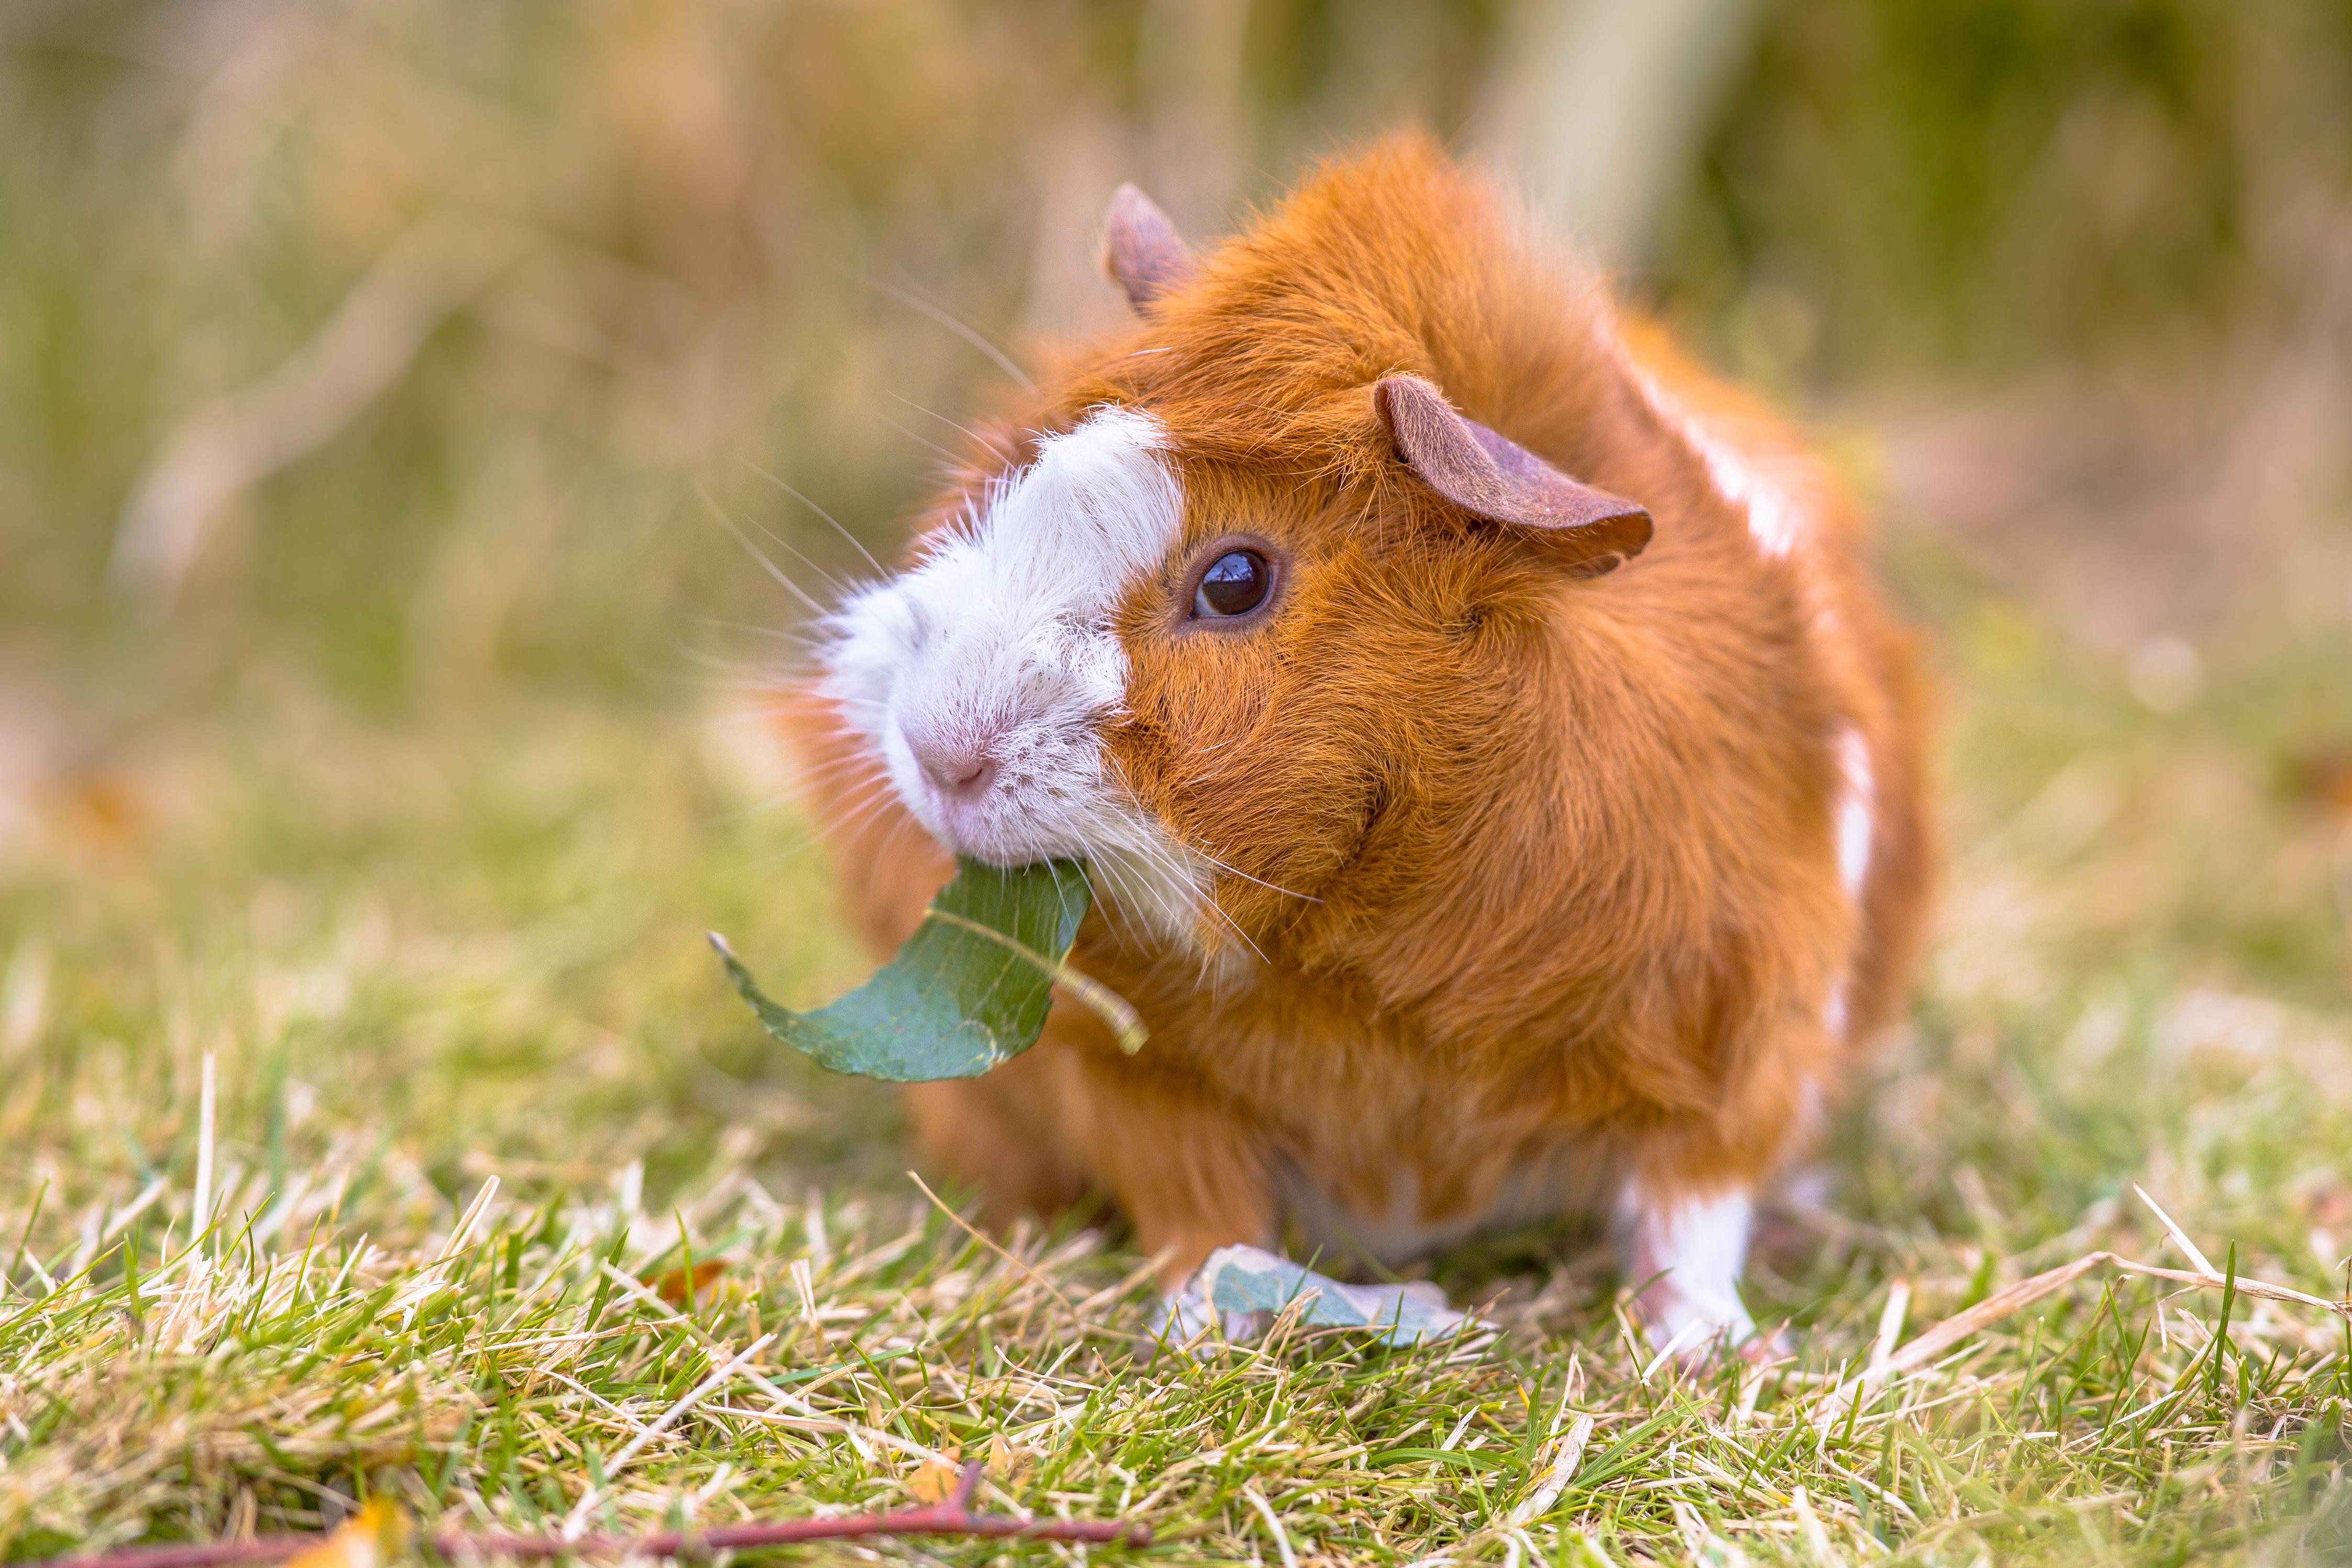 guinea-pig-in-backyard-P7JM9EK